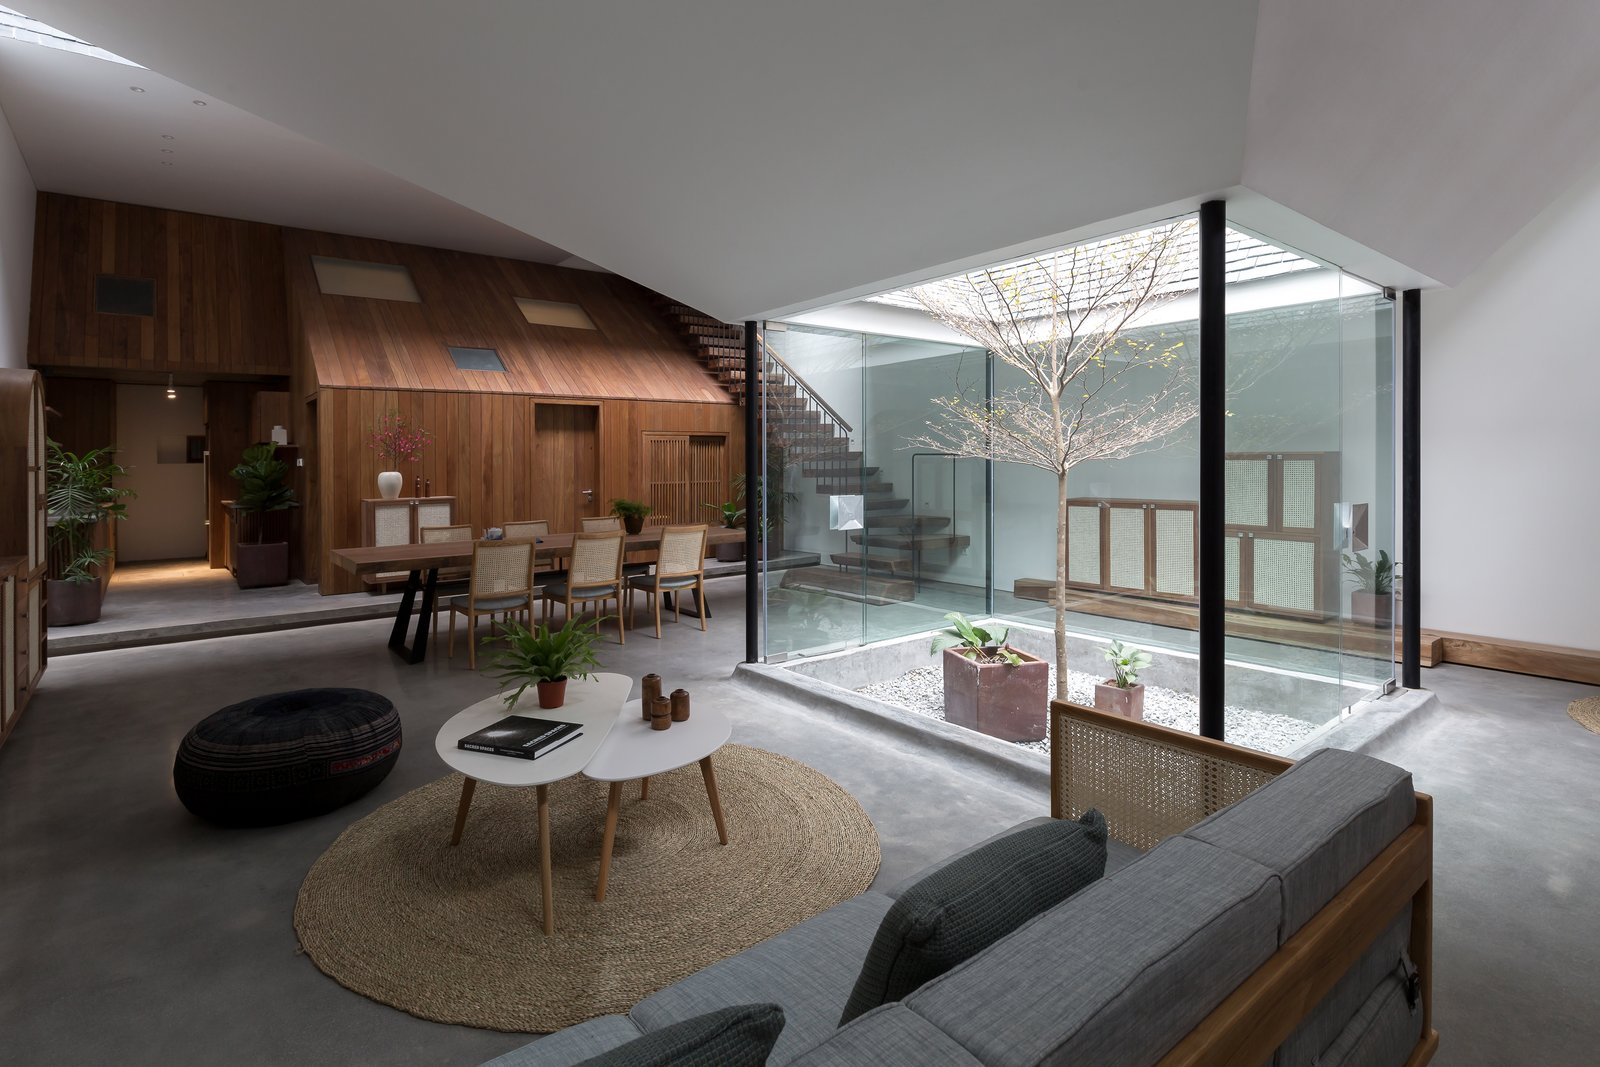 A Vietnamese Abode Draws In Light With a Glass Atrium